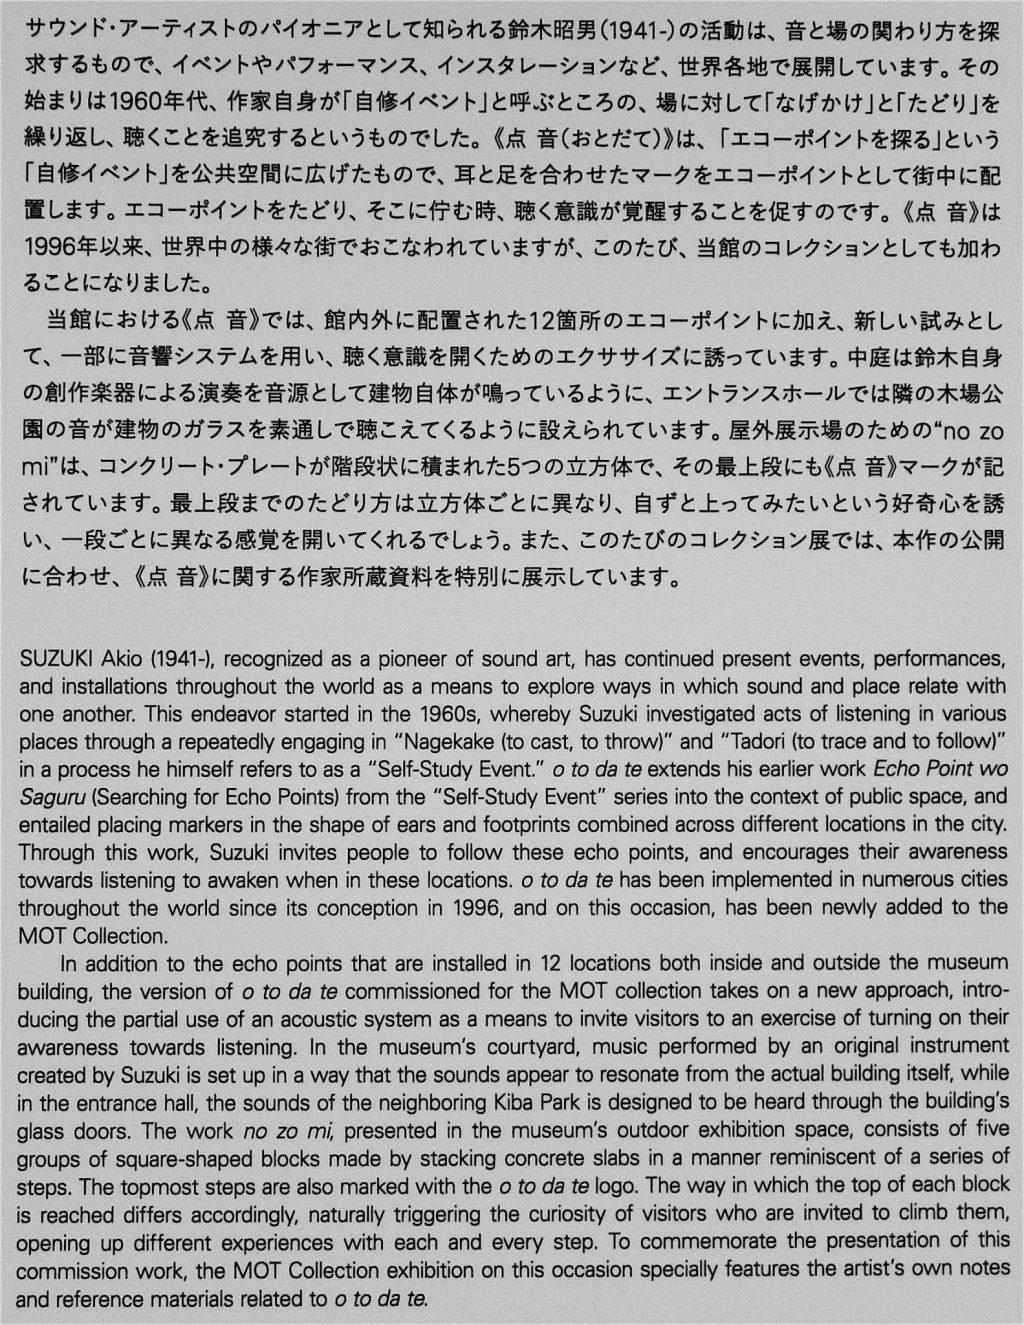 SUZUKI Akio 鈴木昭男 explanation board